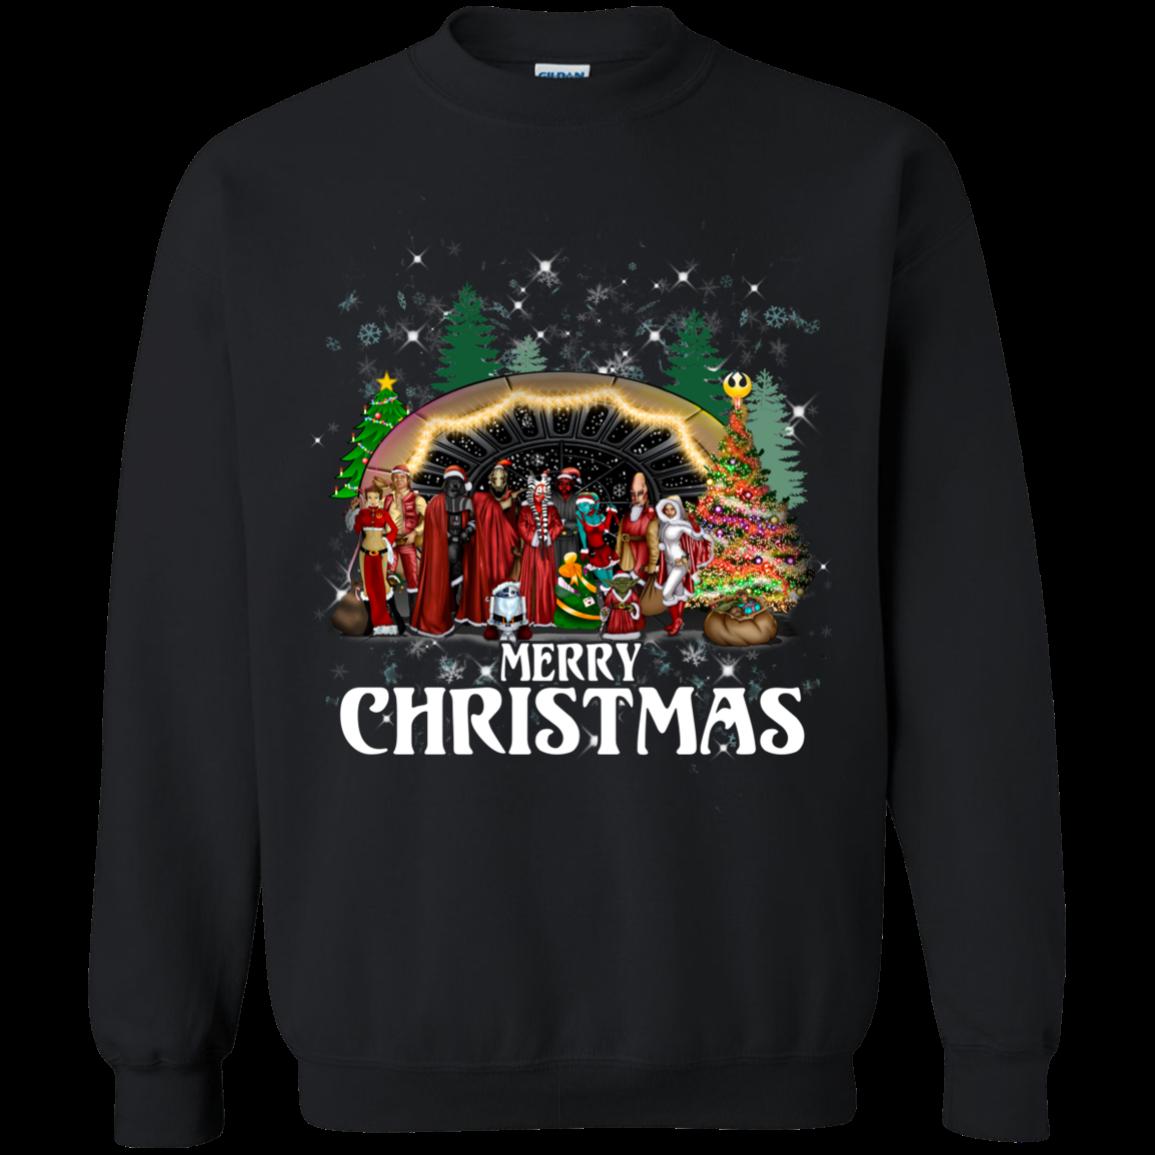 Star Wars Christmas Ugly Sweater Merry Christmas S S Shirts